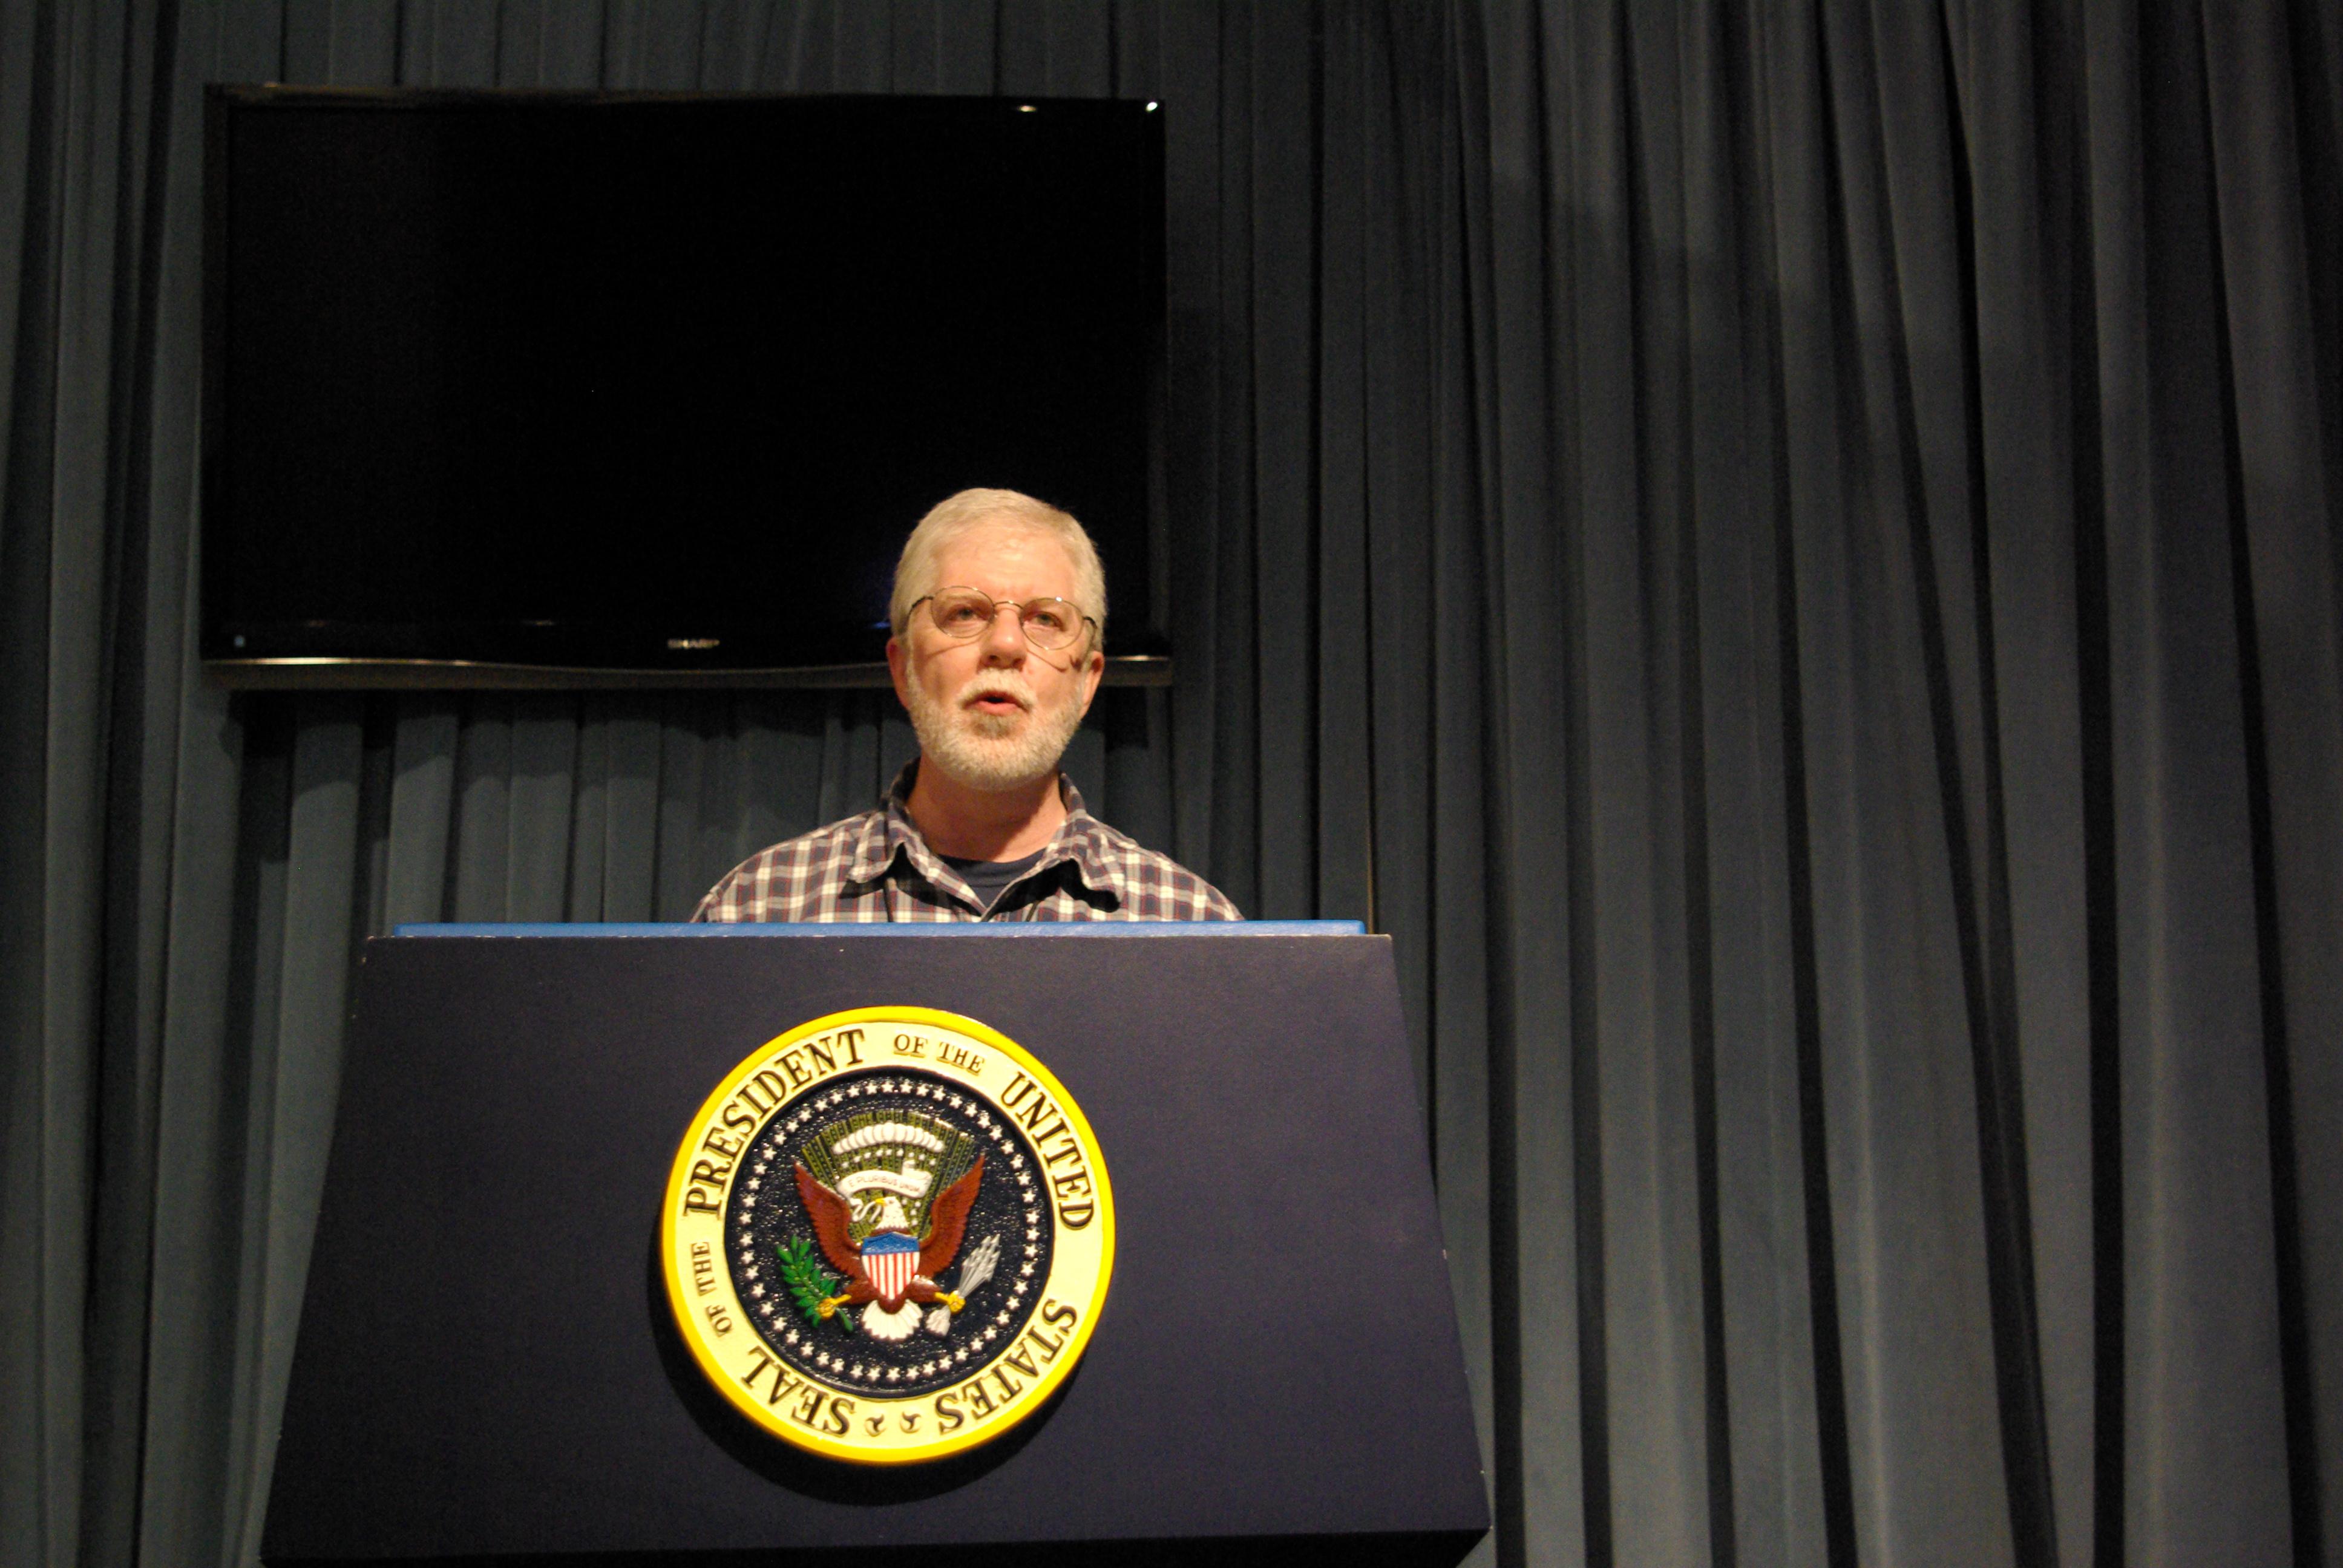 Ed Darrell, presidents on weekends